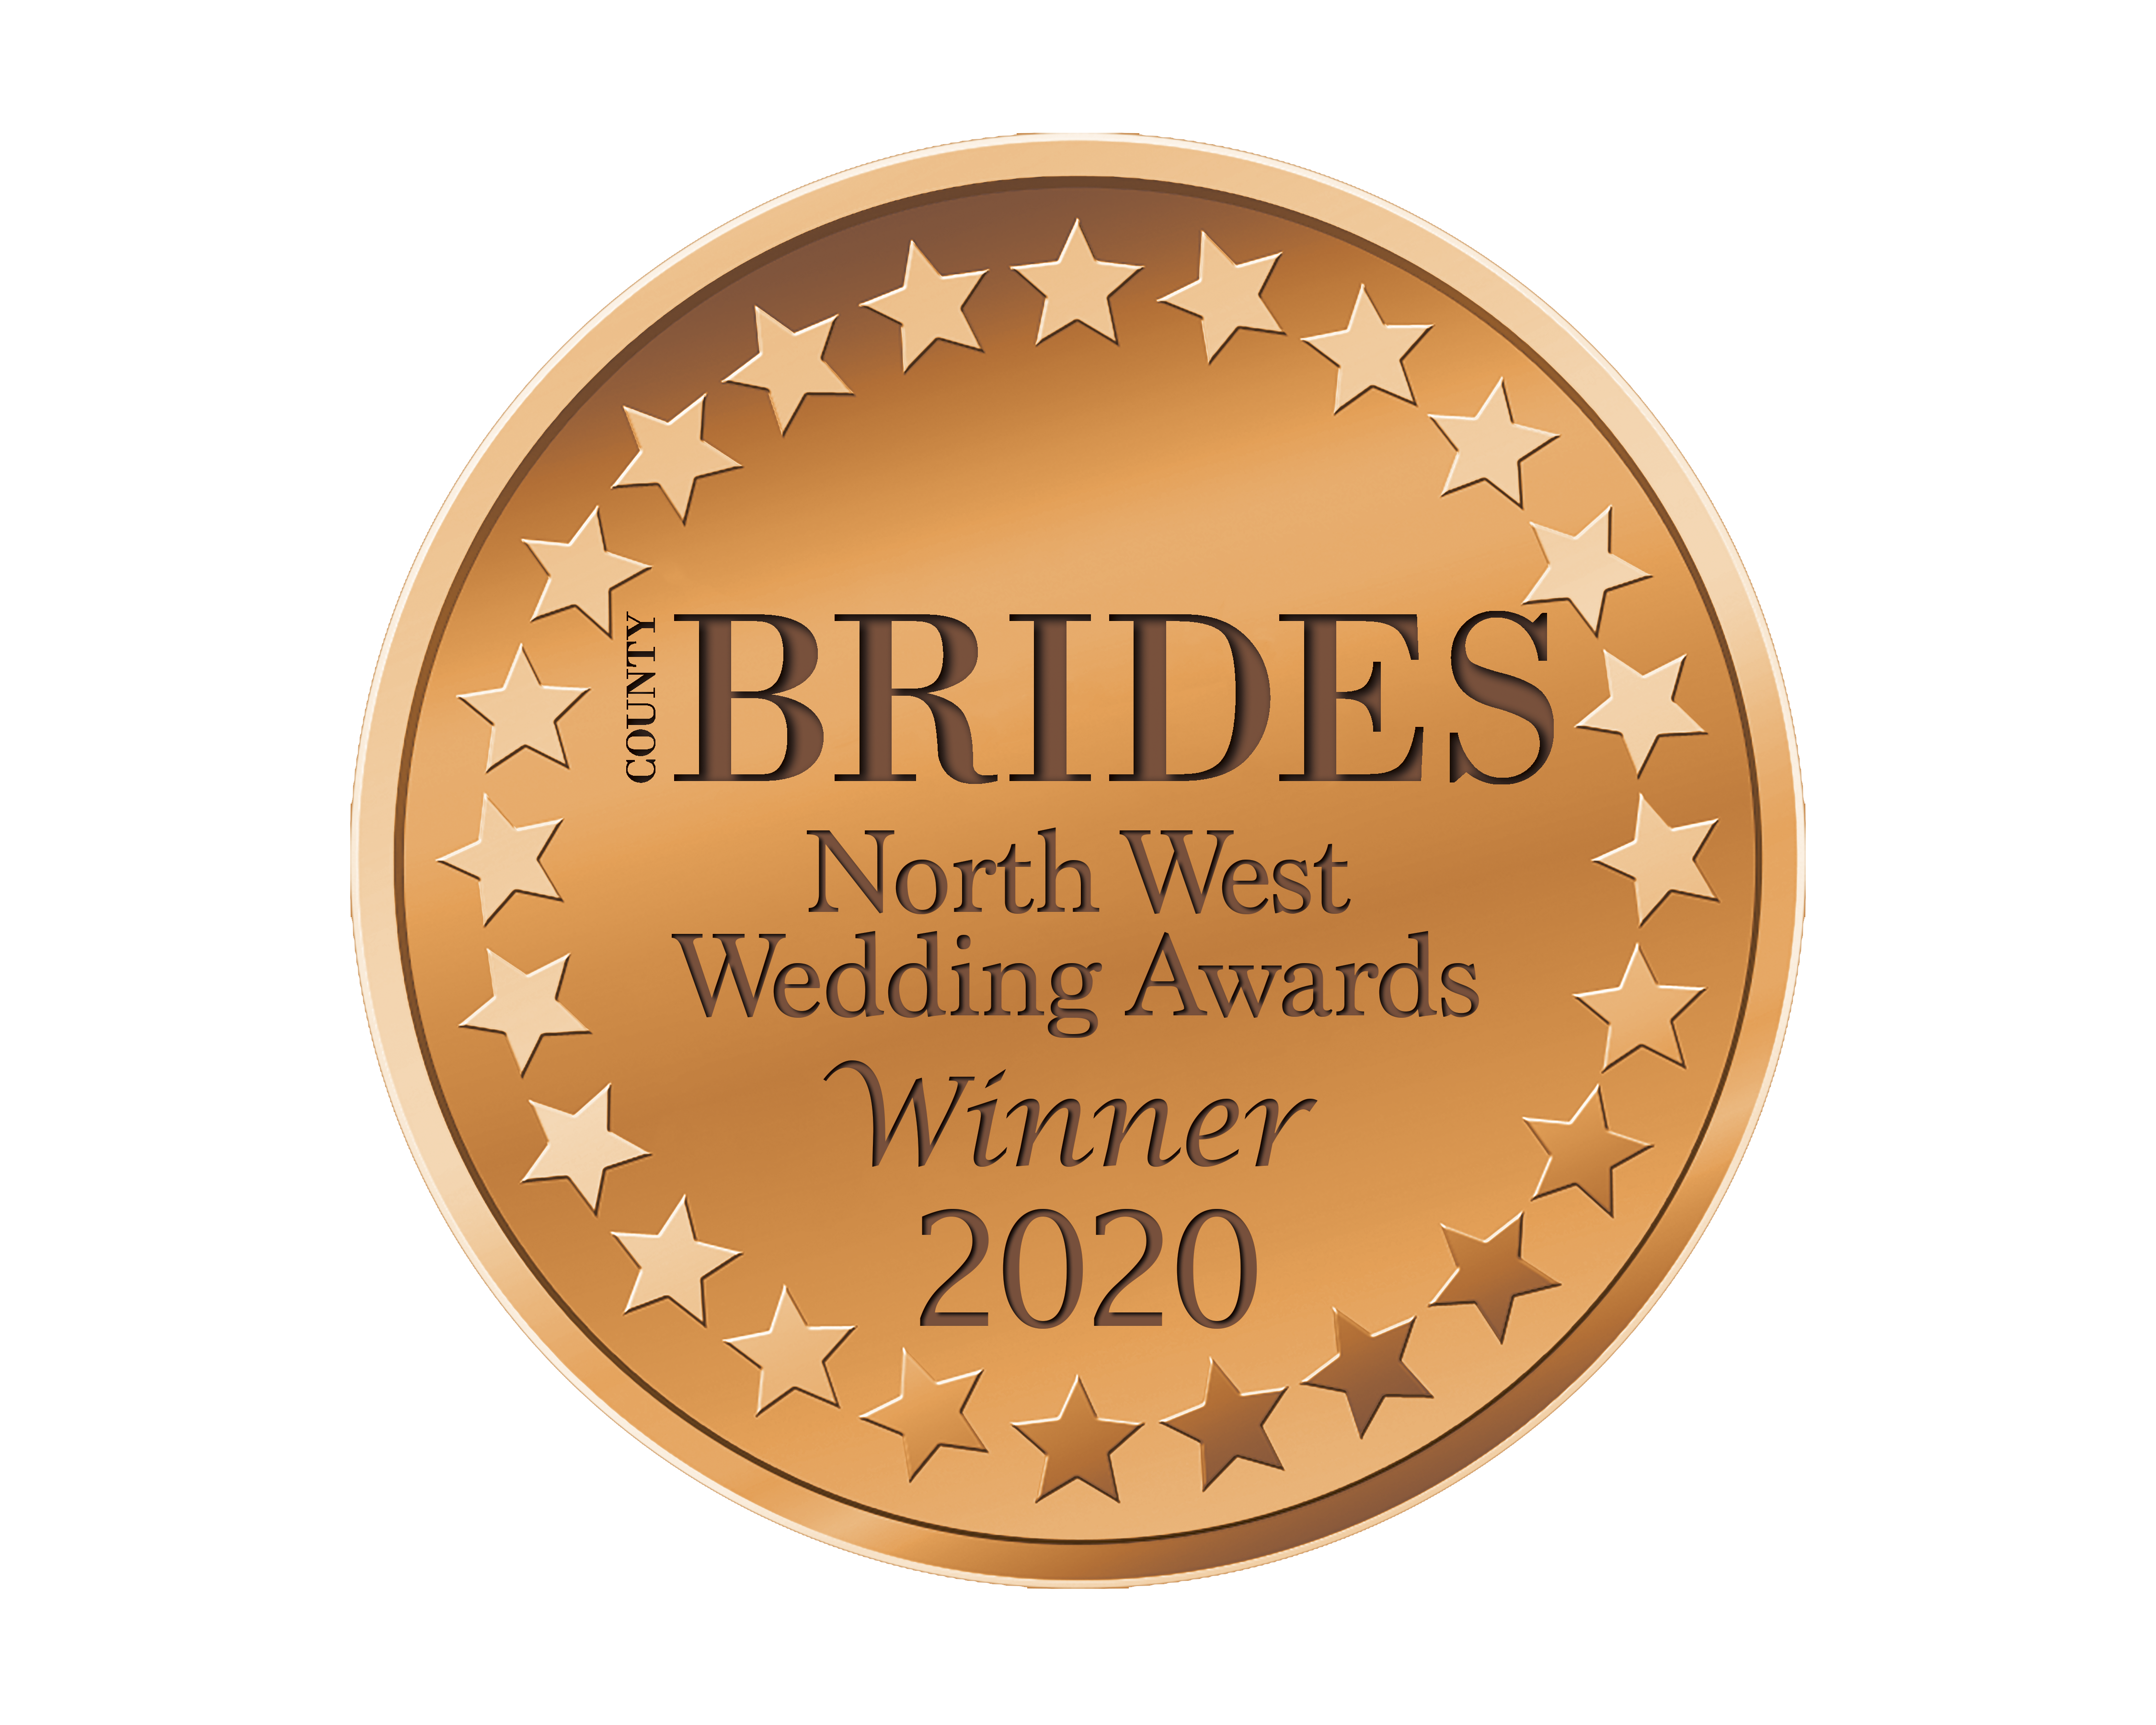 County Brides Best Wedding Venue Lancashire 2020